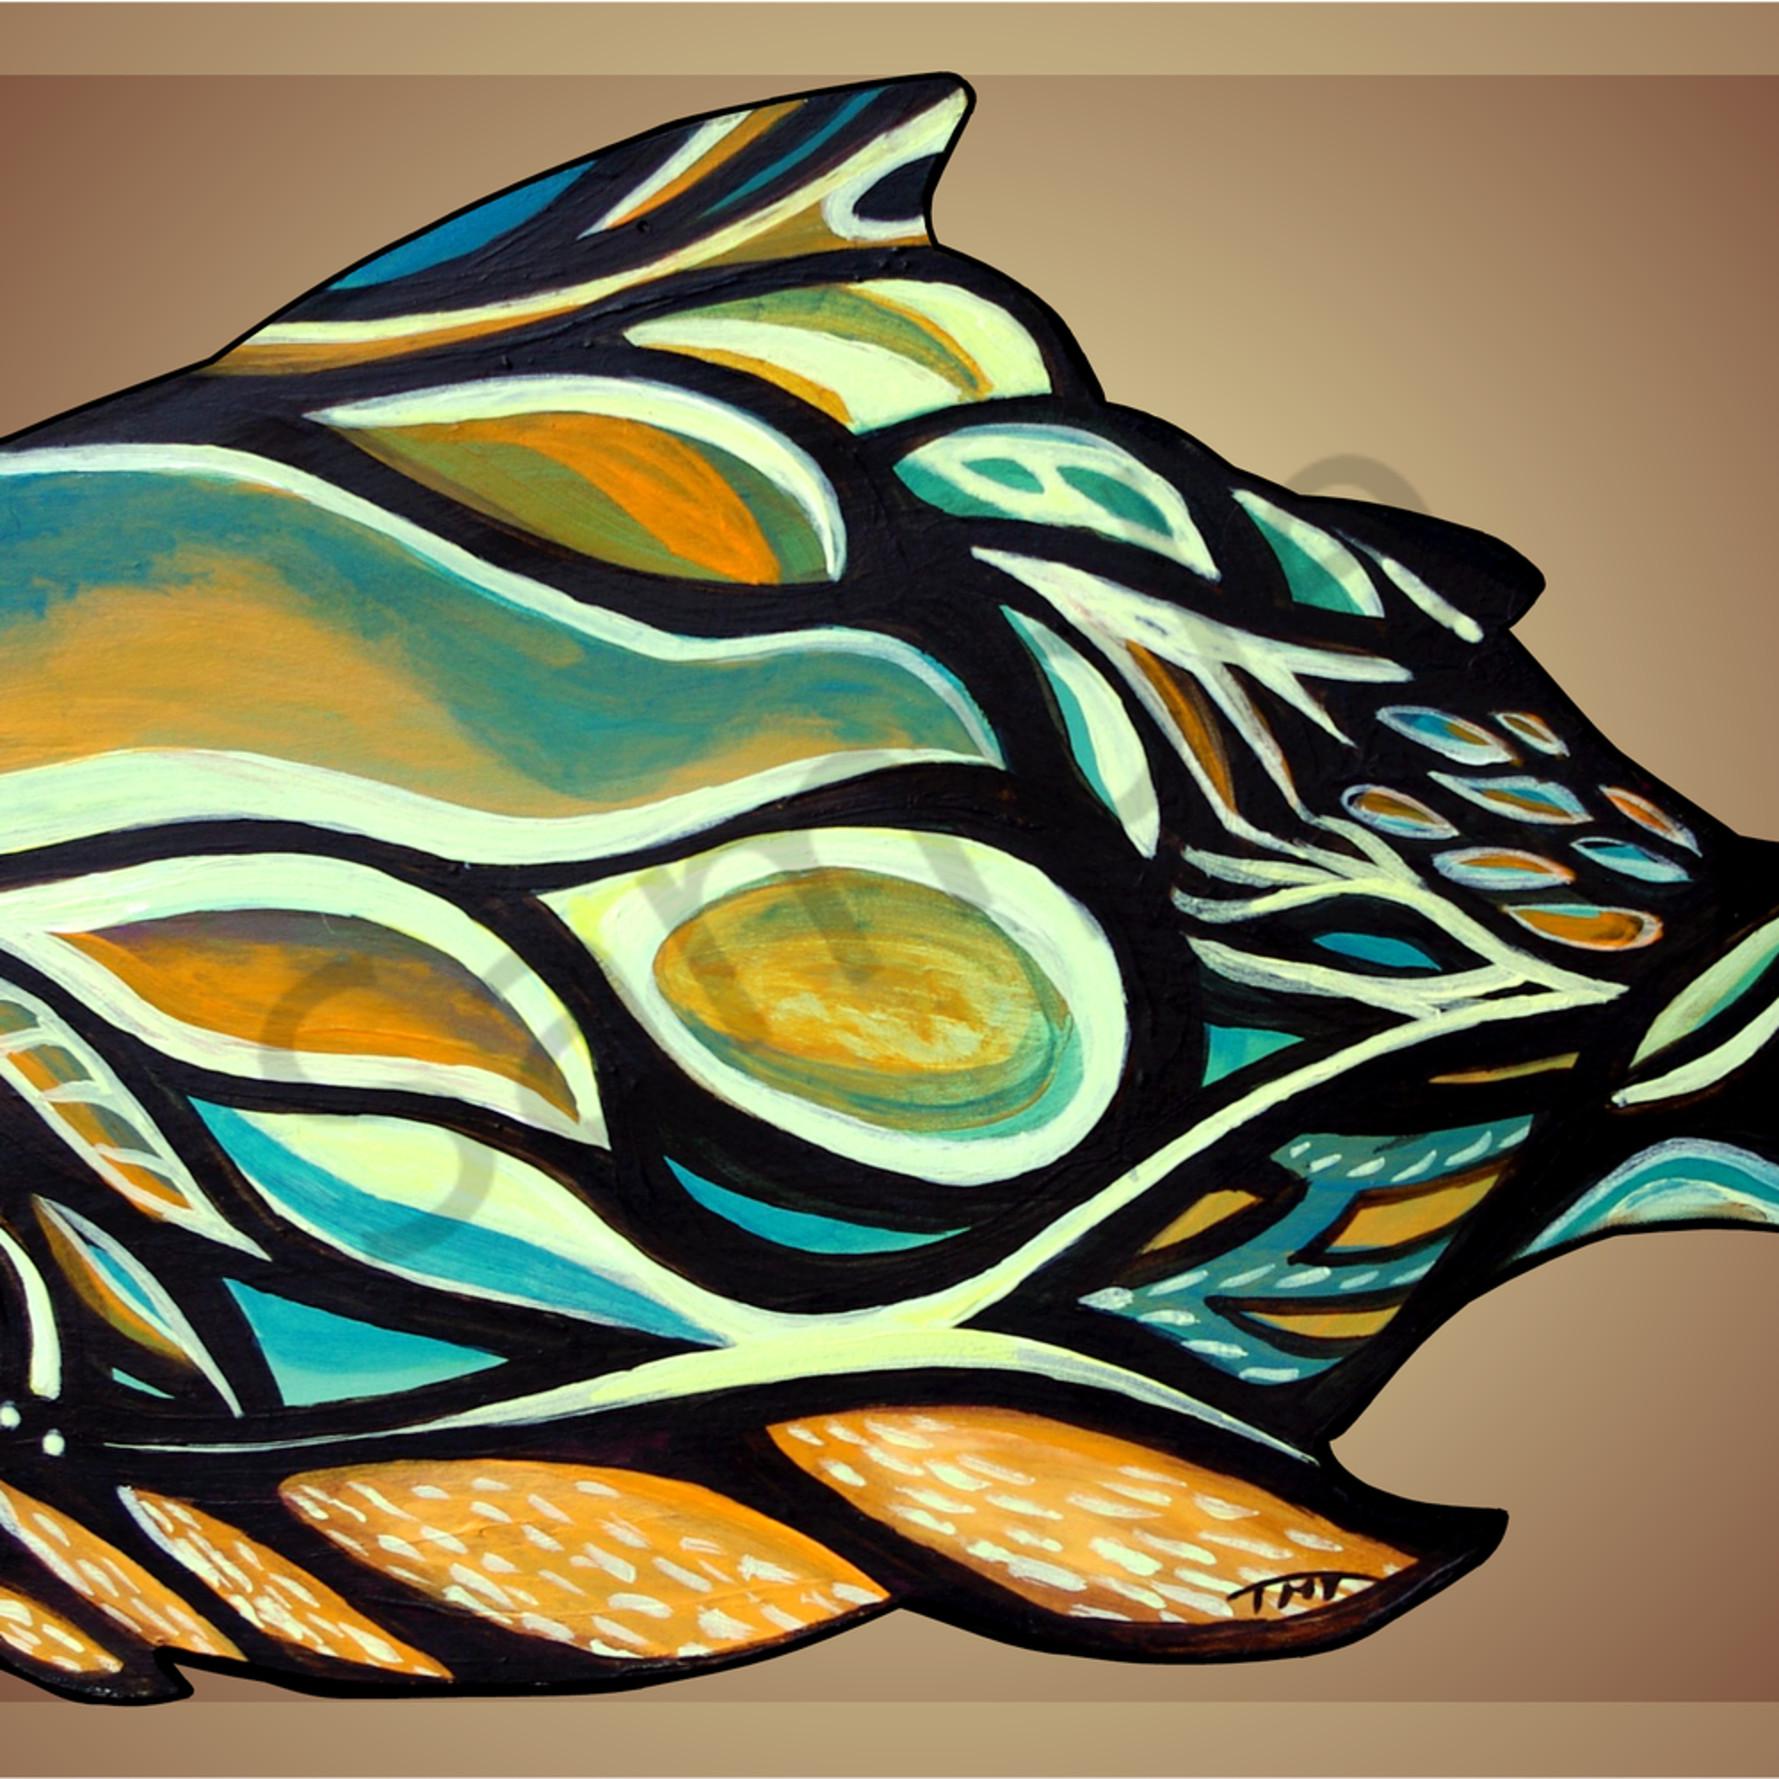 Haidafish front hz6t14